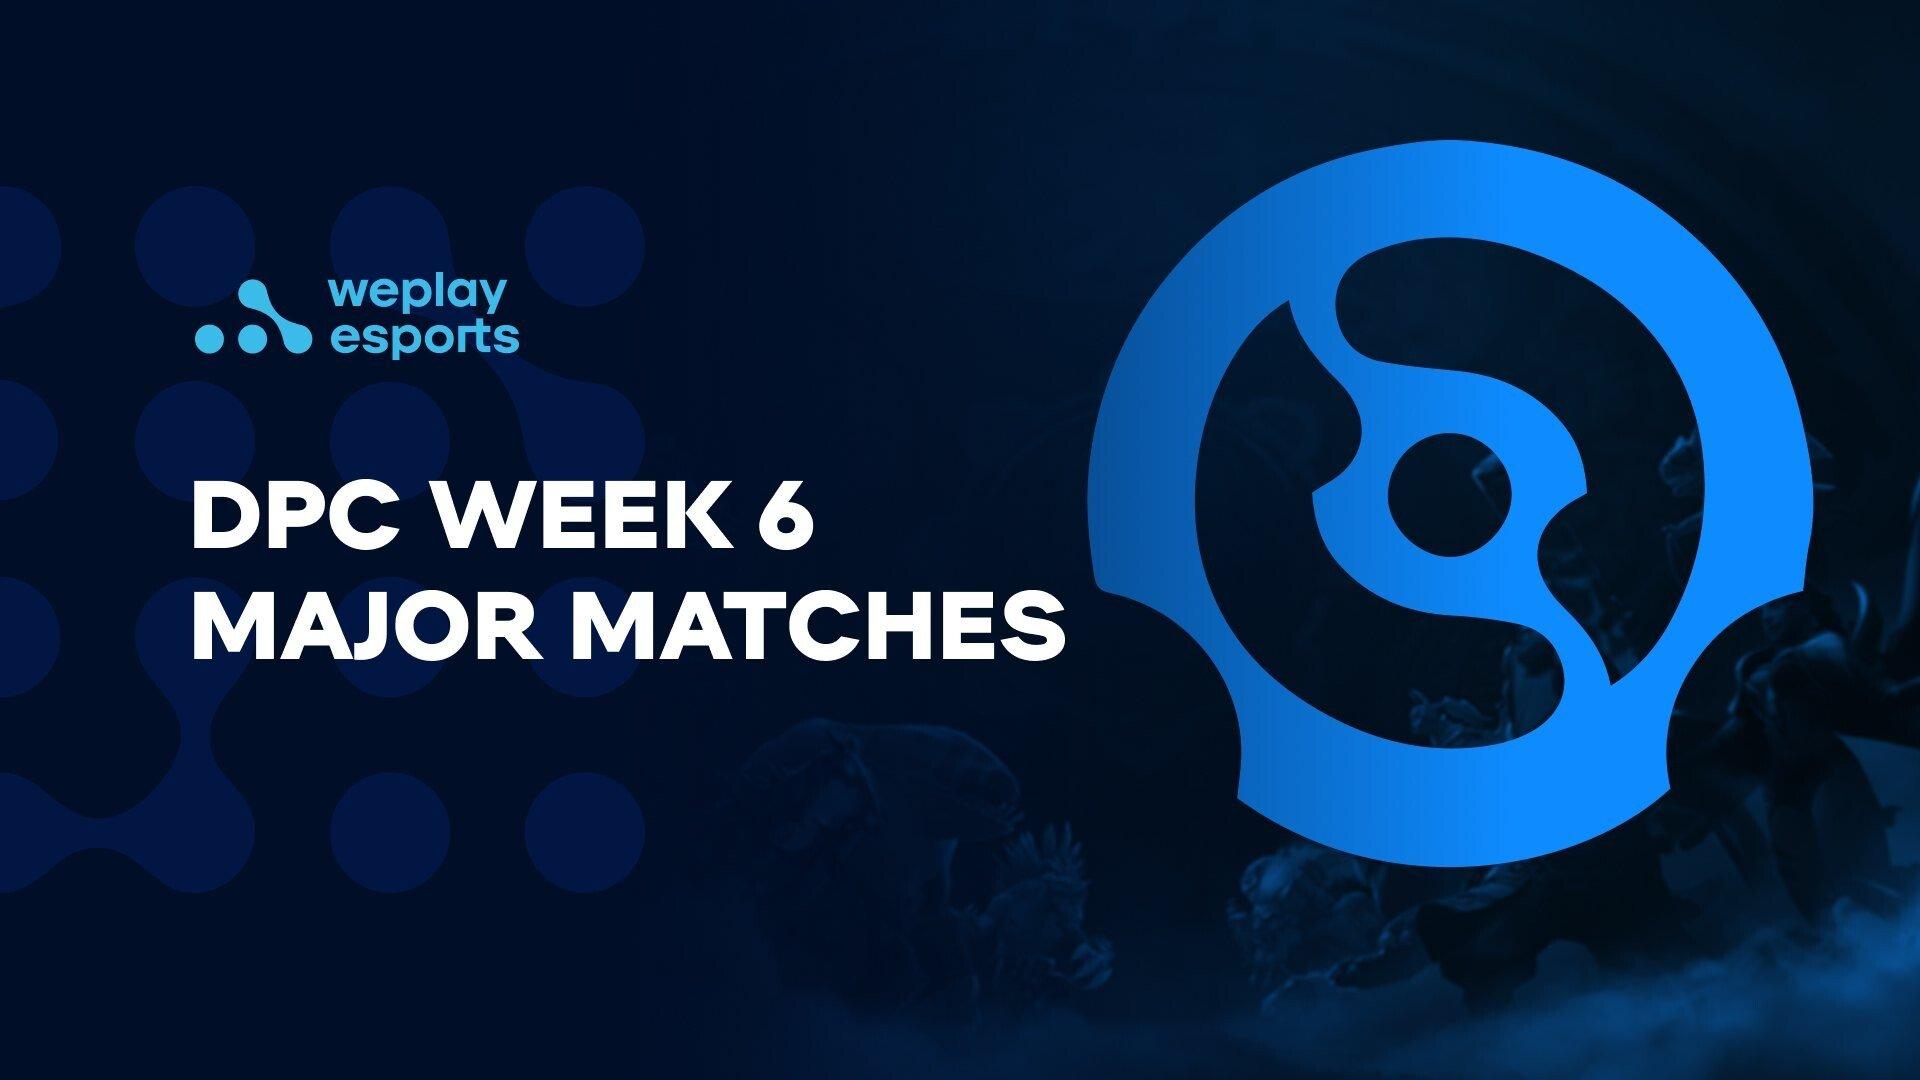 Five DPC Week 6 Major Matches